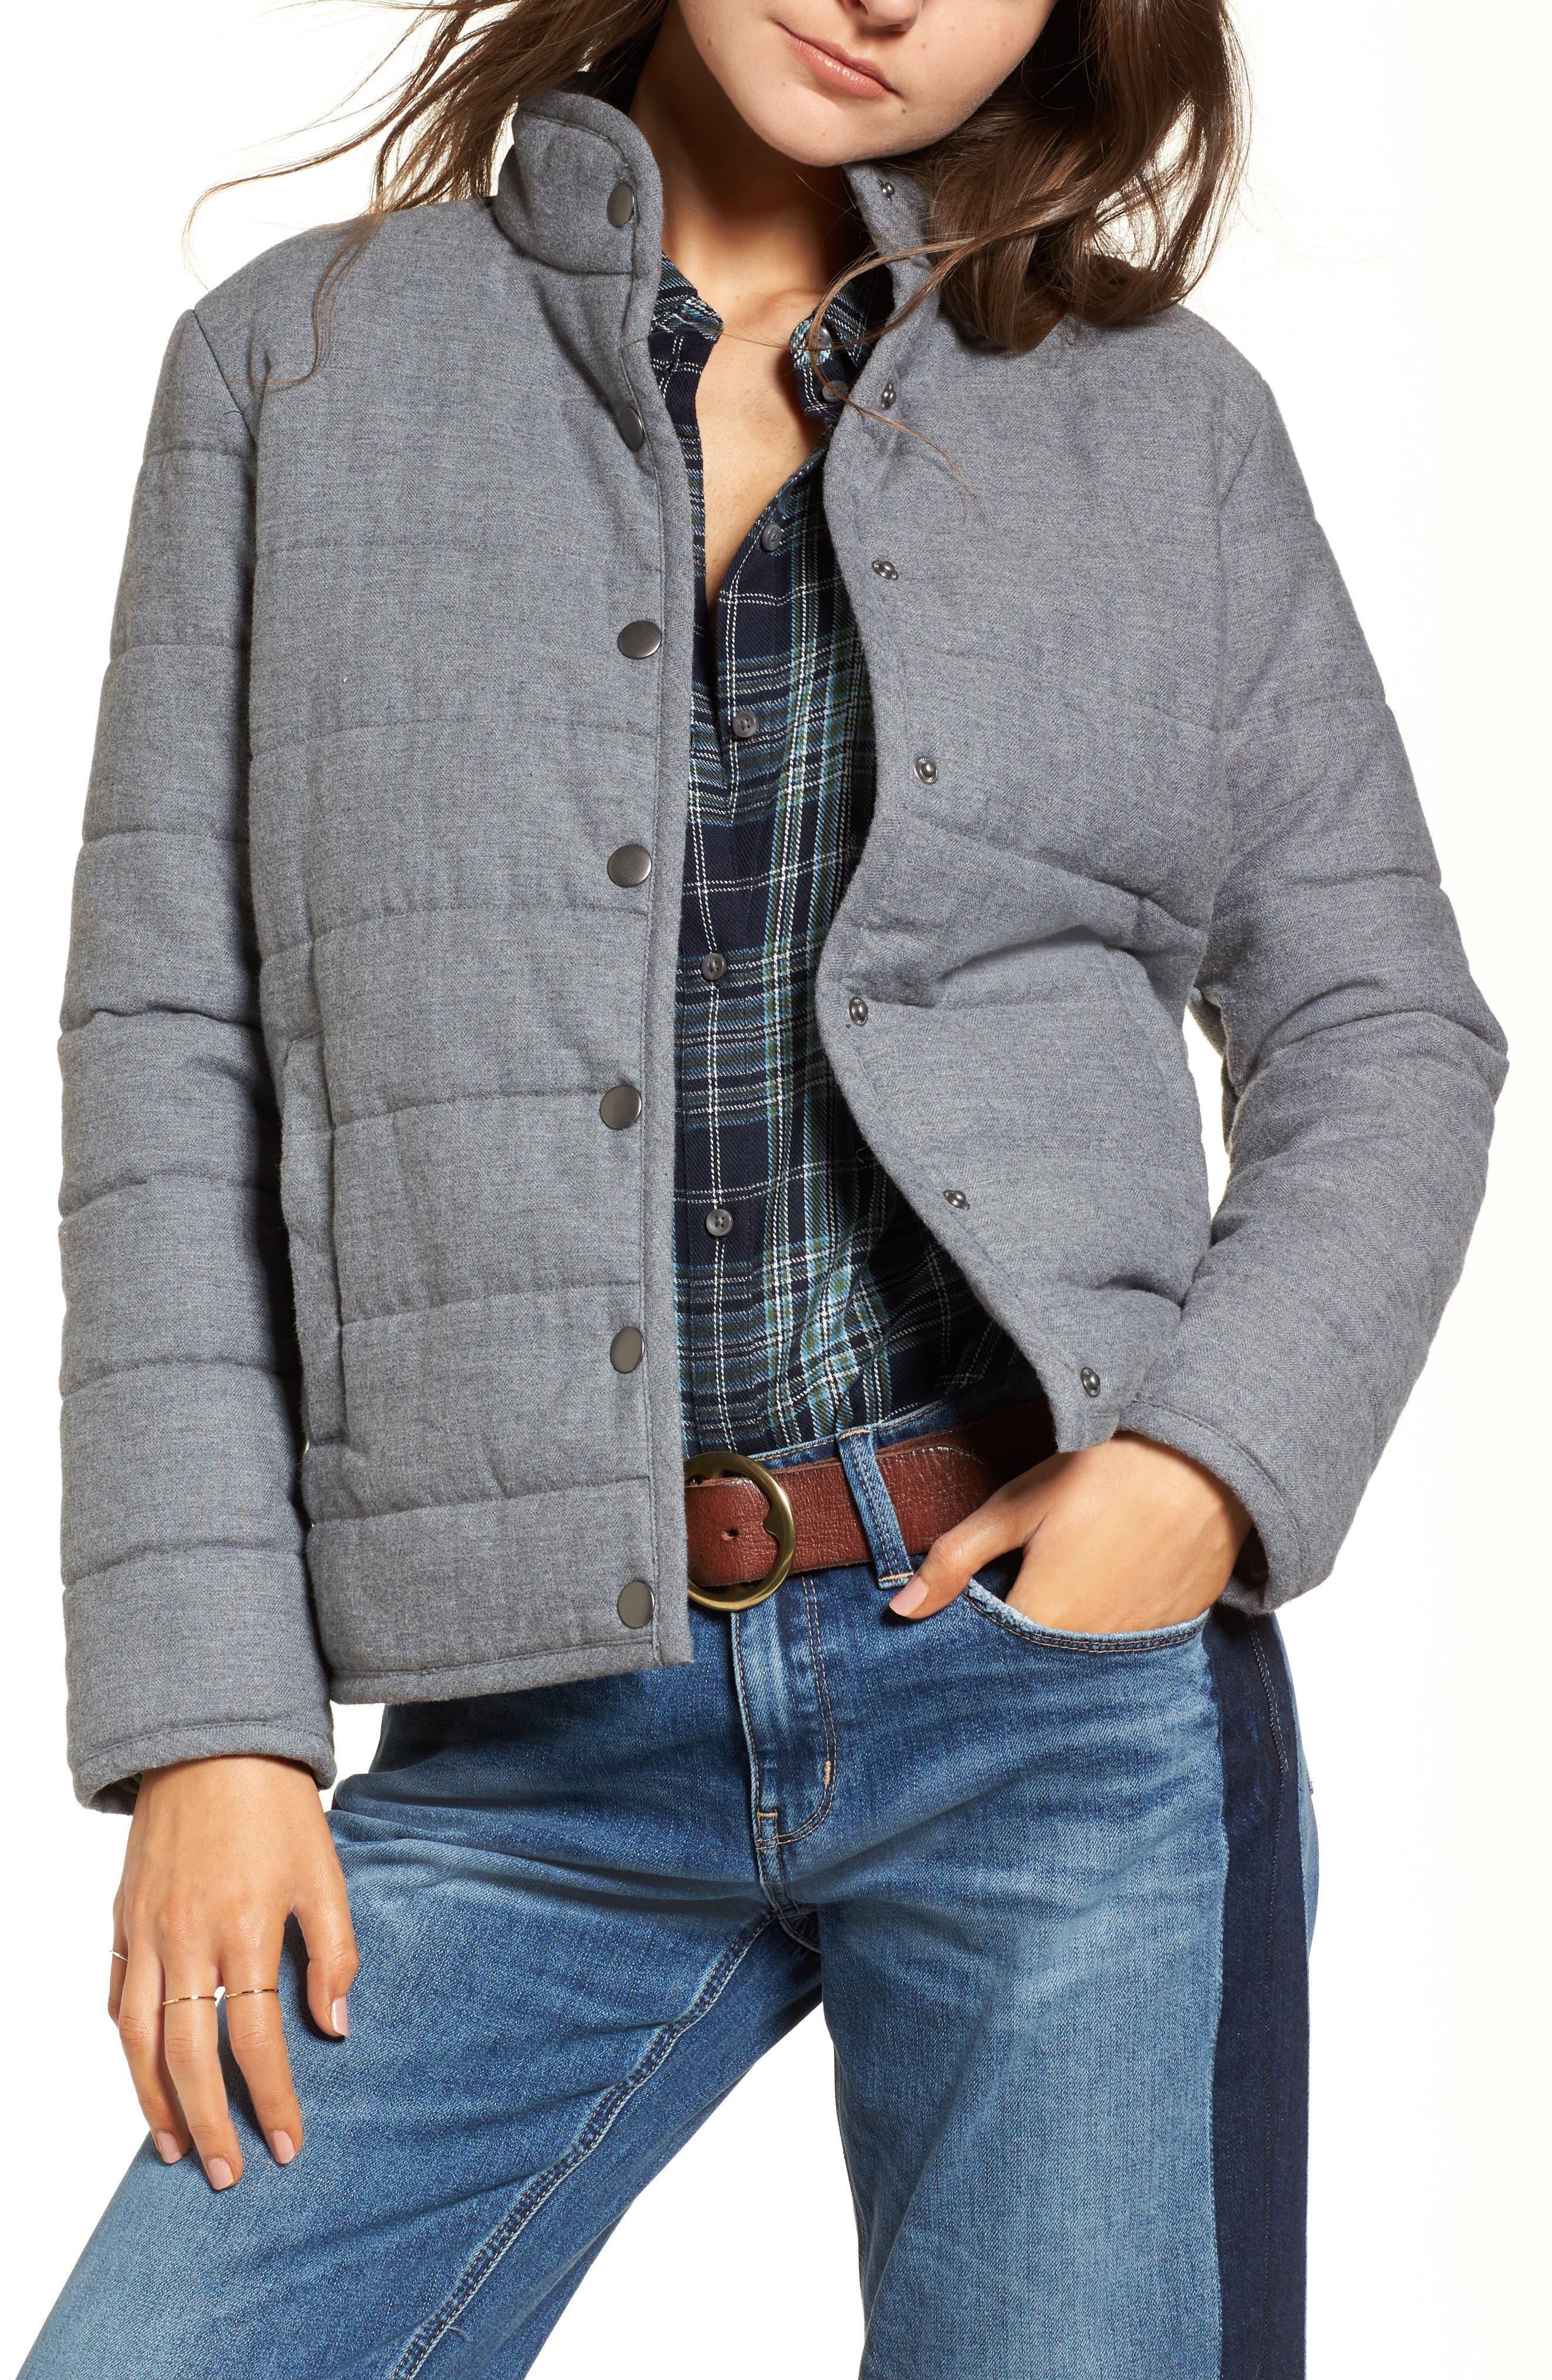 Treasure & Bond Flannel Puffer Jacket